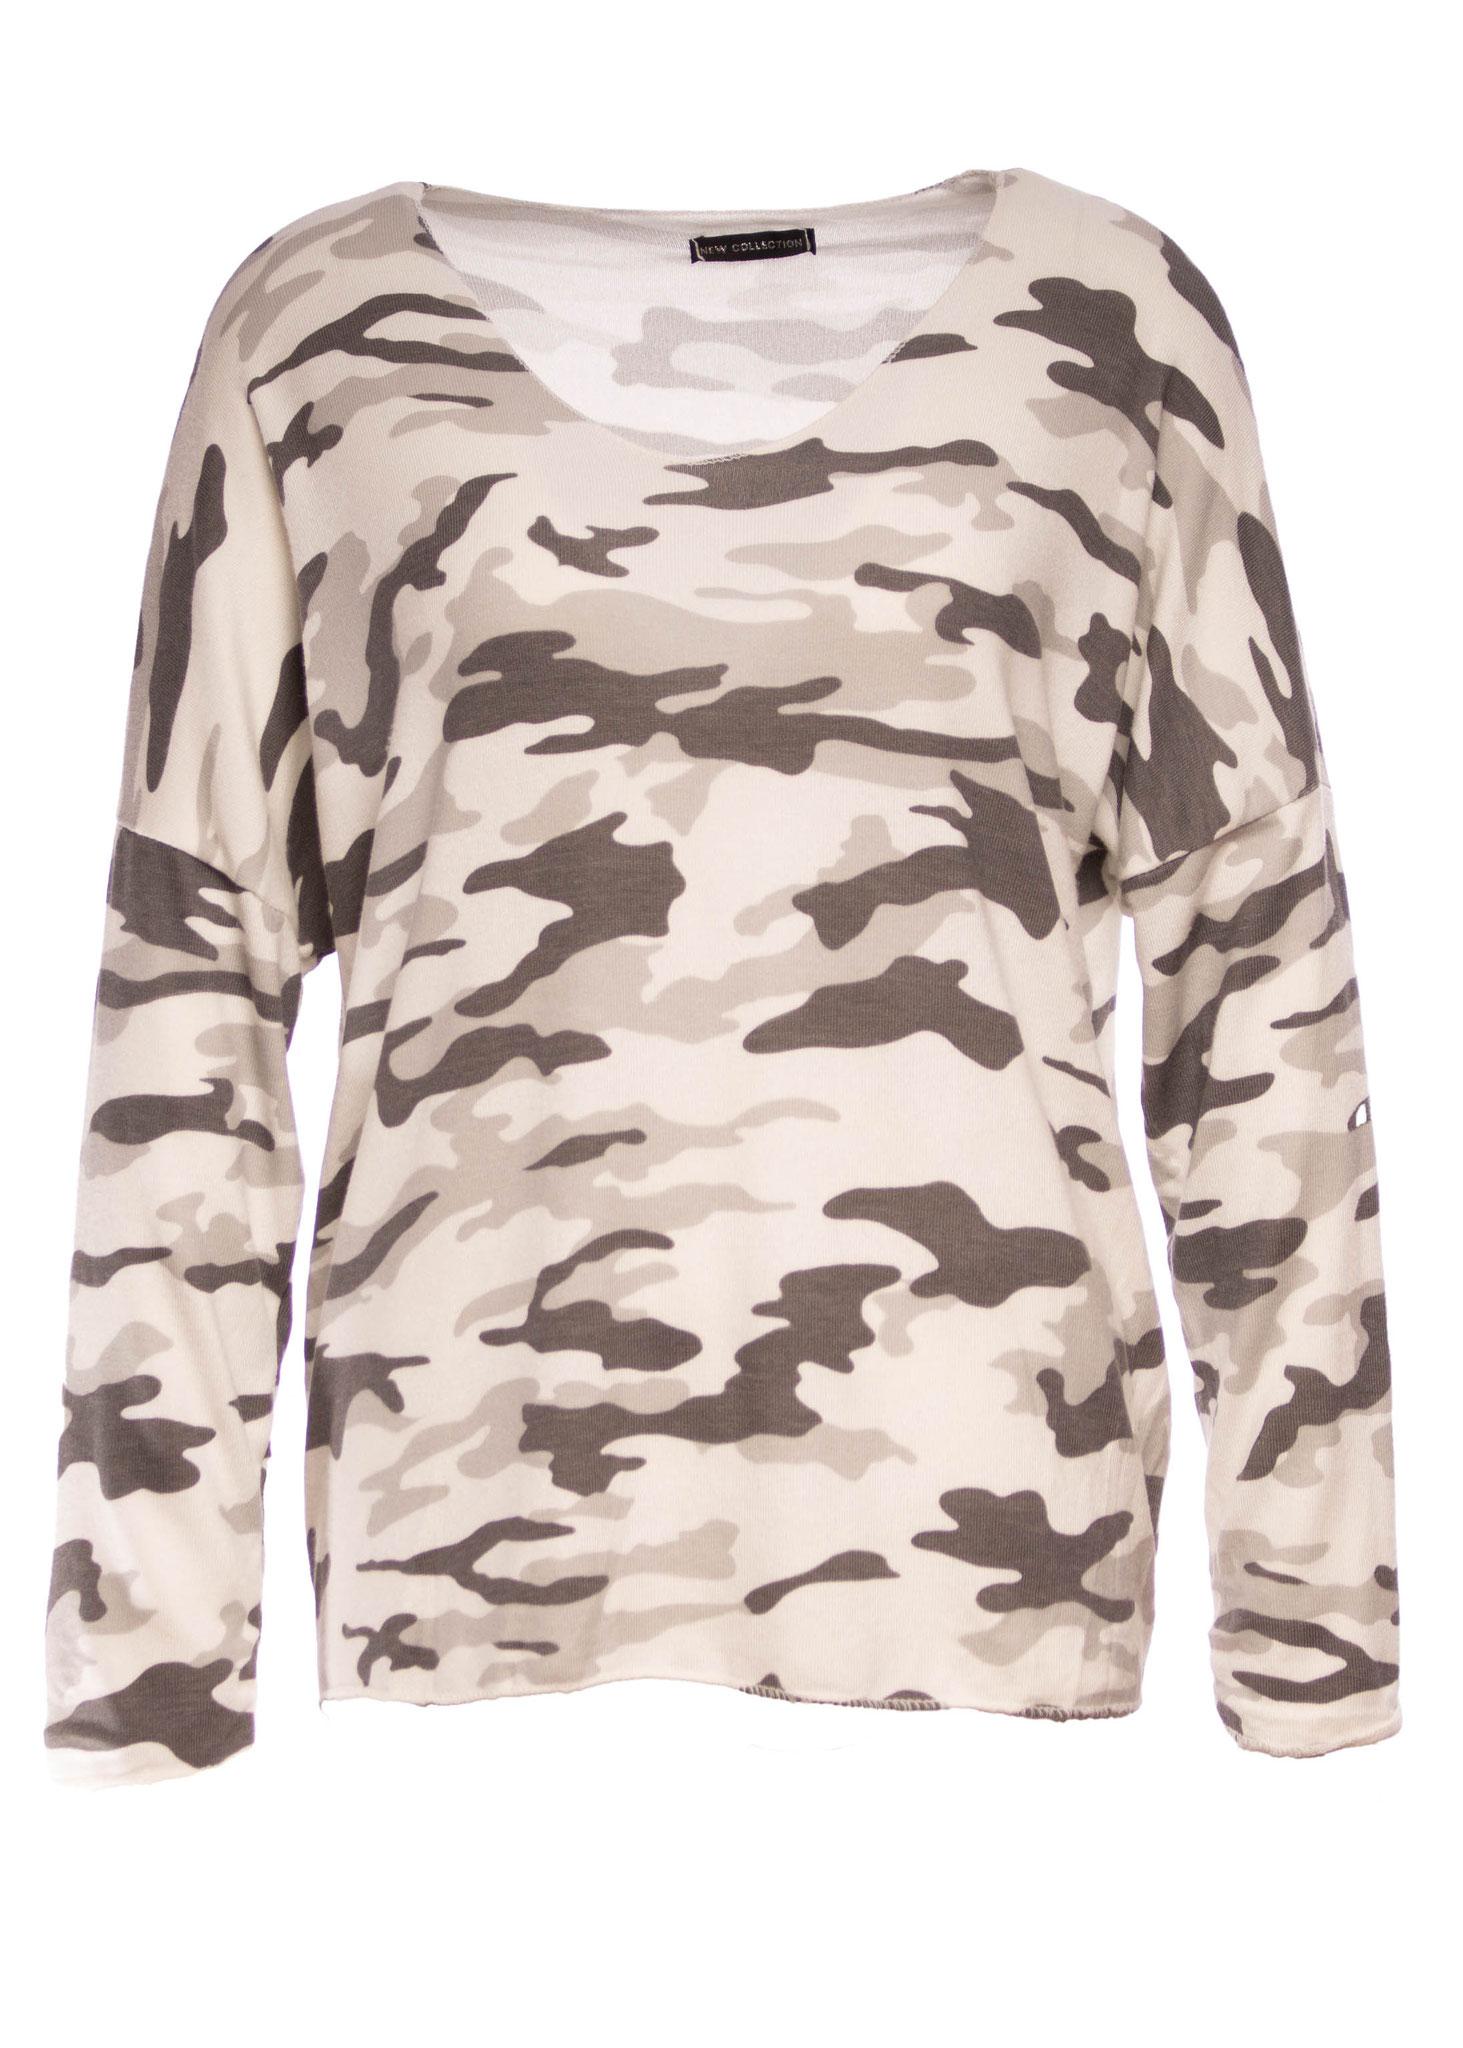 Shirt Camouflage 22,99€